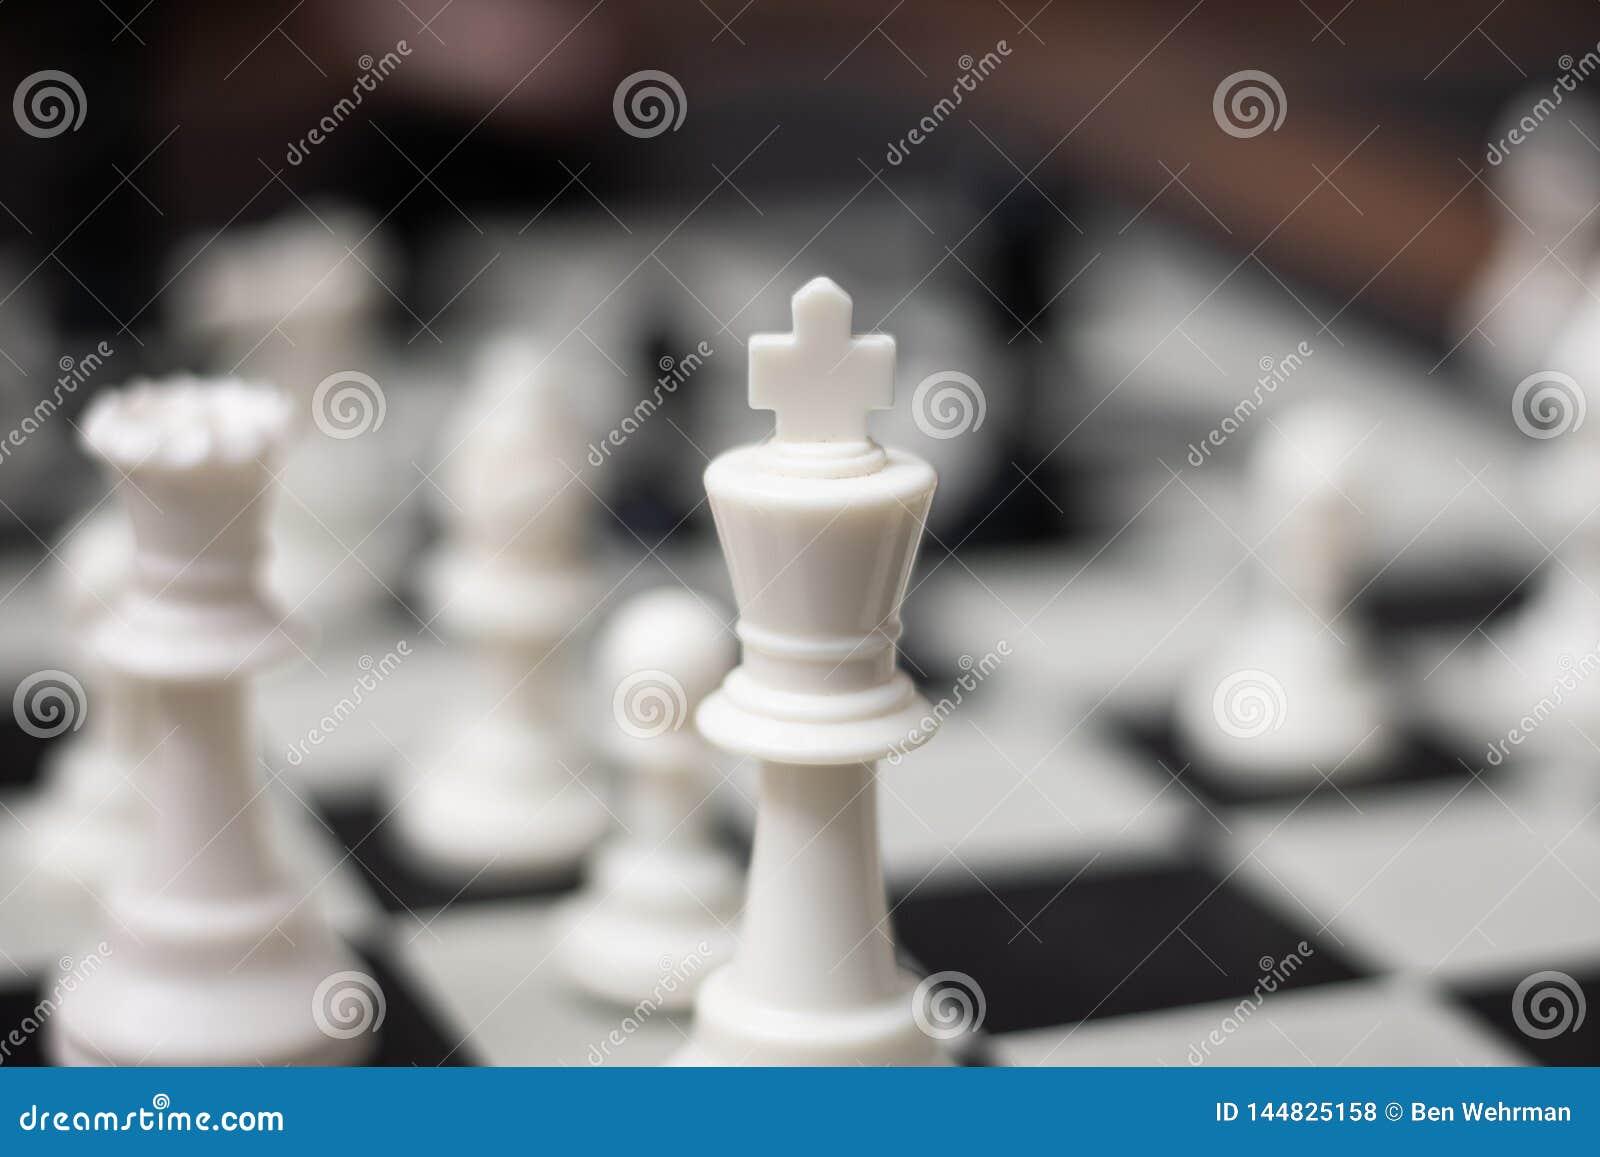 Часть короля шахматов